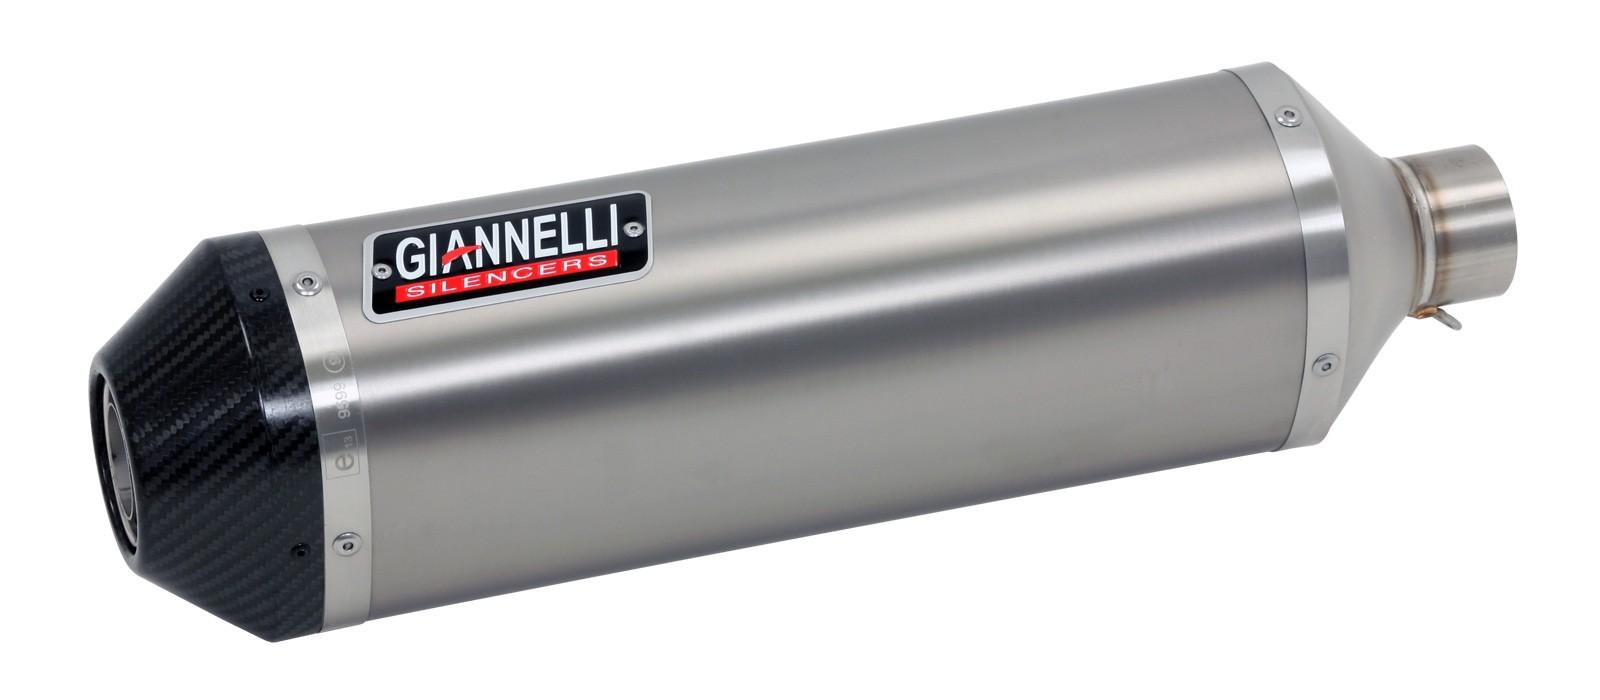 ESCAPES GIANNELLI YAMAHA - Sistema completo IPERSPORT Silenciador carbono con terminación carbono Yamaha MT-09 Giannelli